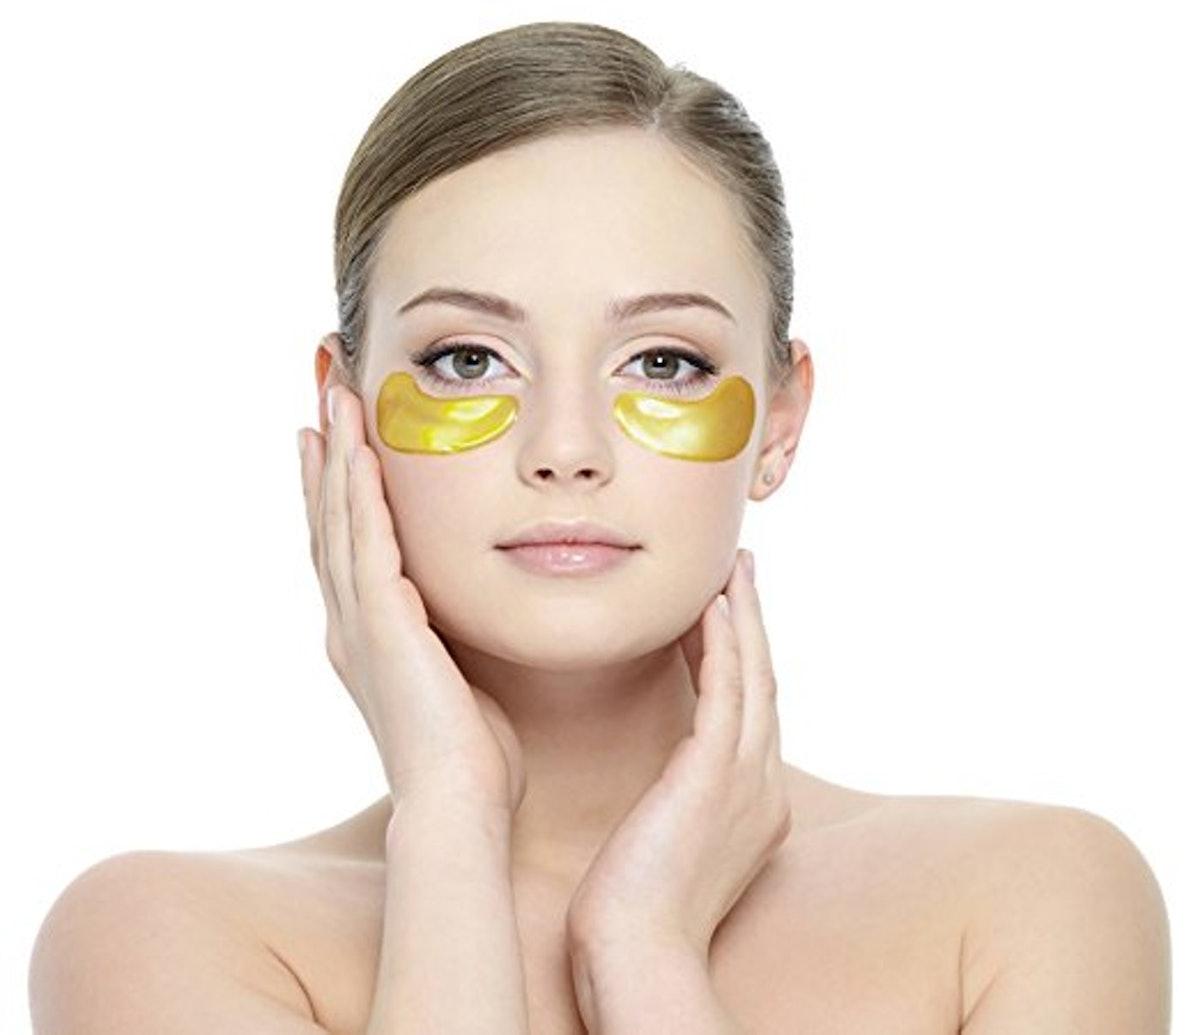 LA PURE 24K Gold Eye Treatment Mask